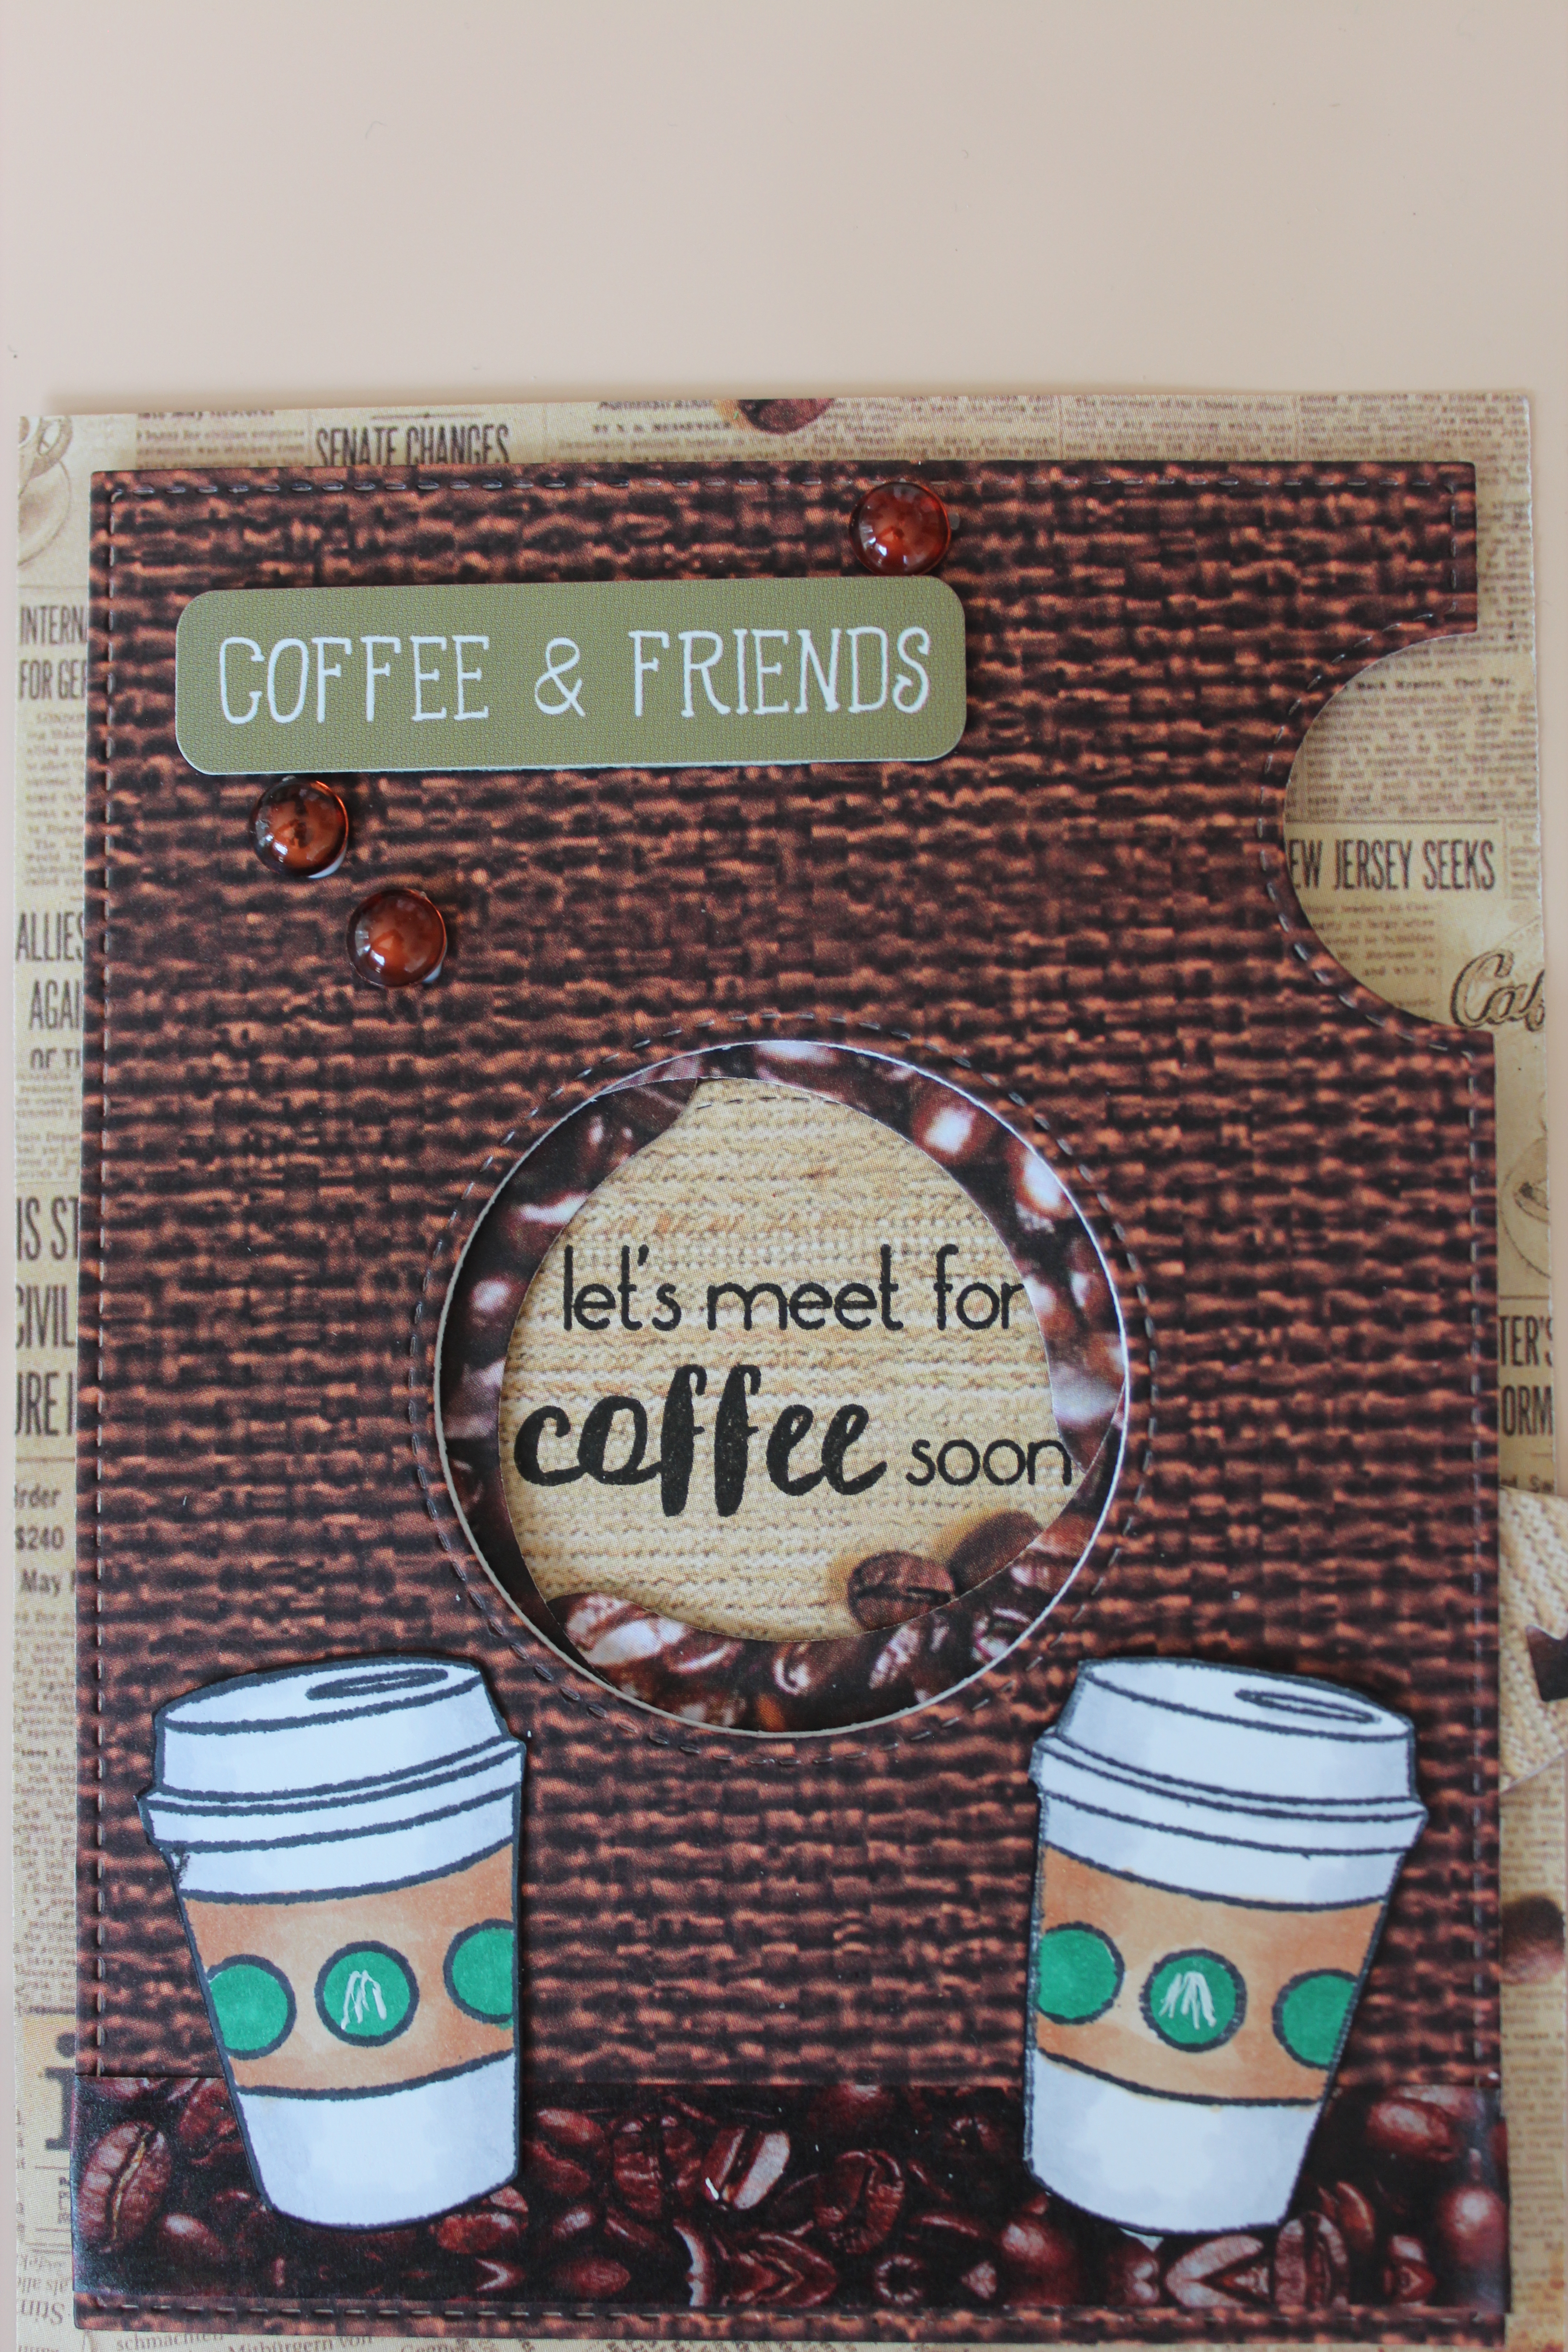 ritated ciffee 2